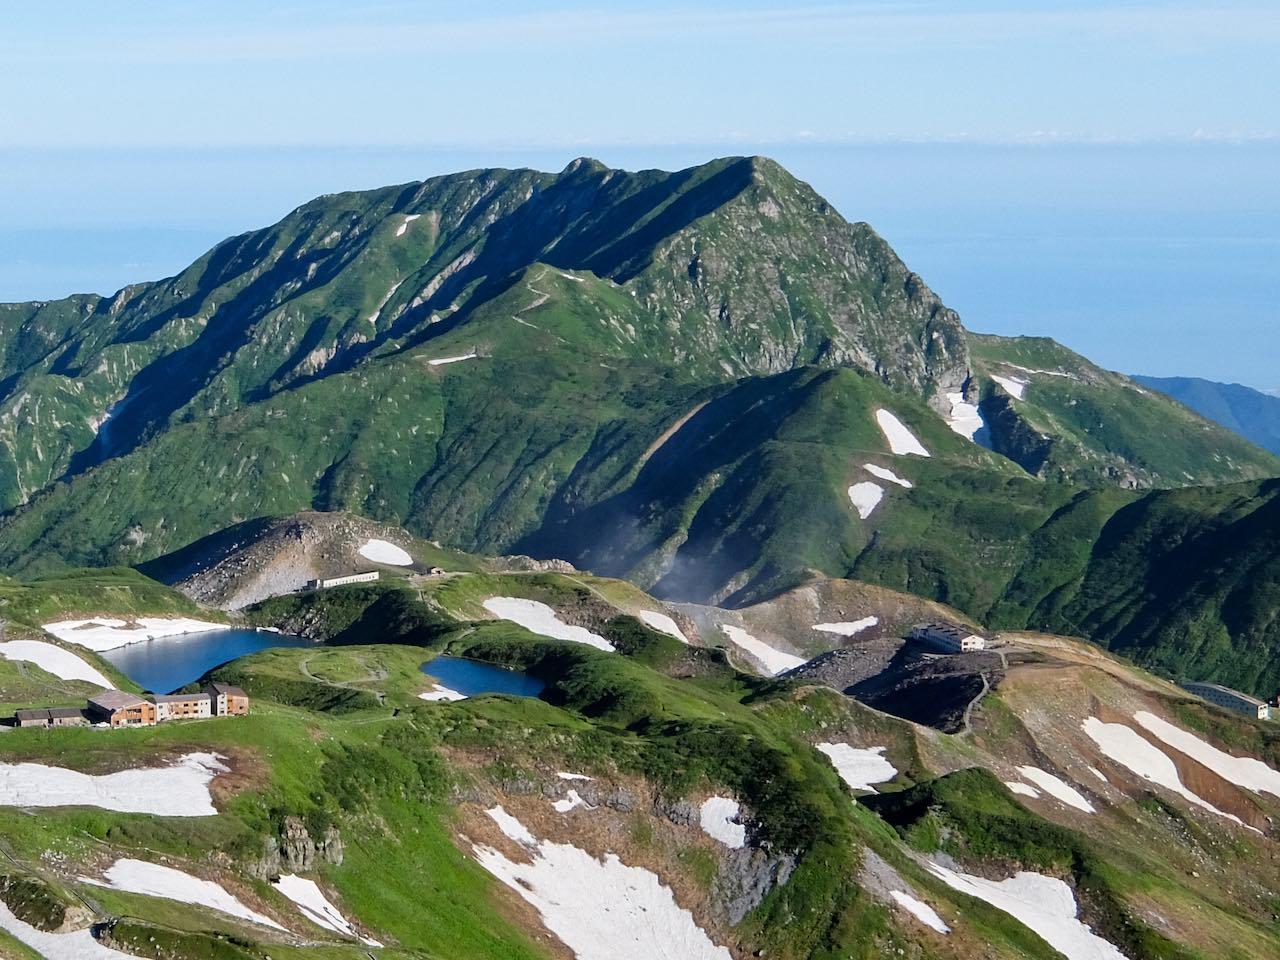 Hiking from Tateyama - Murodo  Hiking from Tateyama across the Northern Japan Alps Hiking from Tateyama Murodo